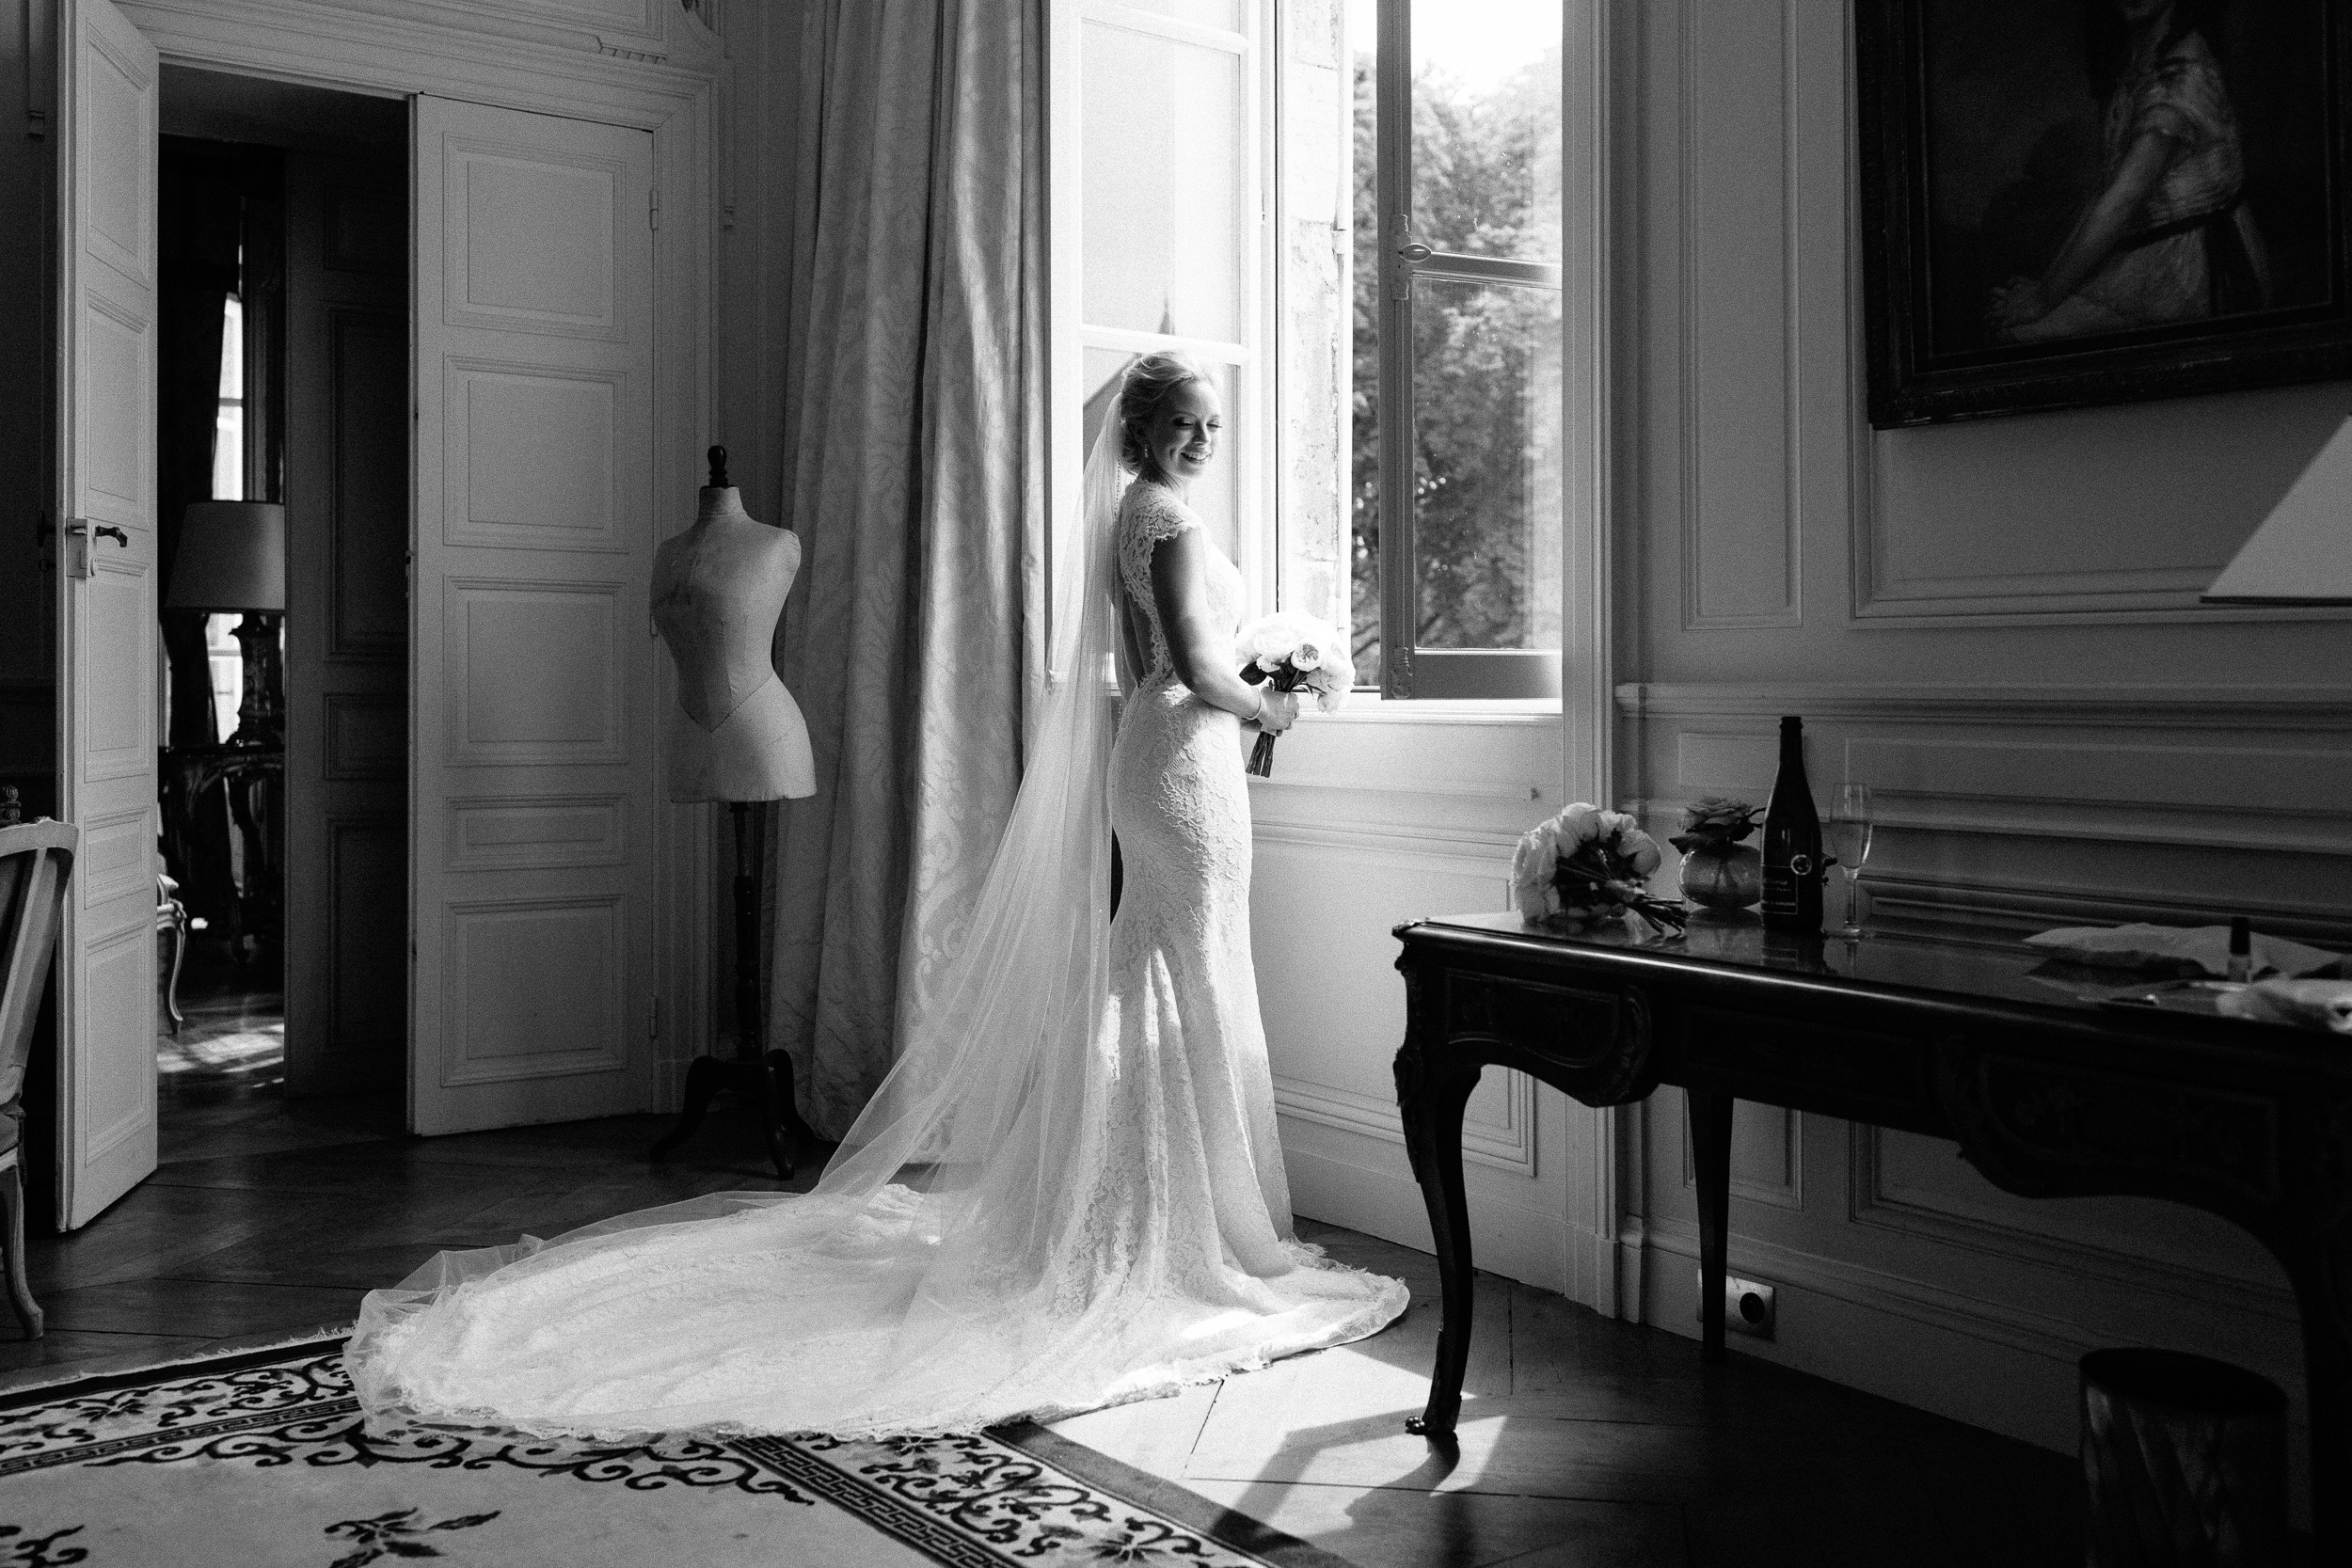 Wedding-Chateau-de-Varennes-035.jpg